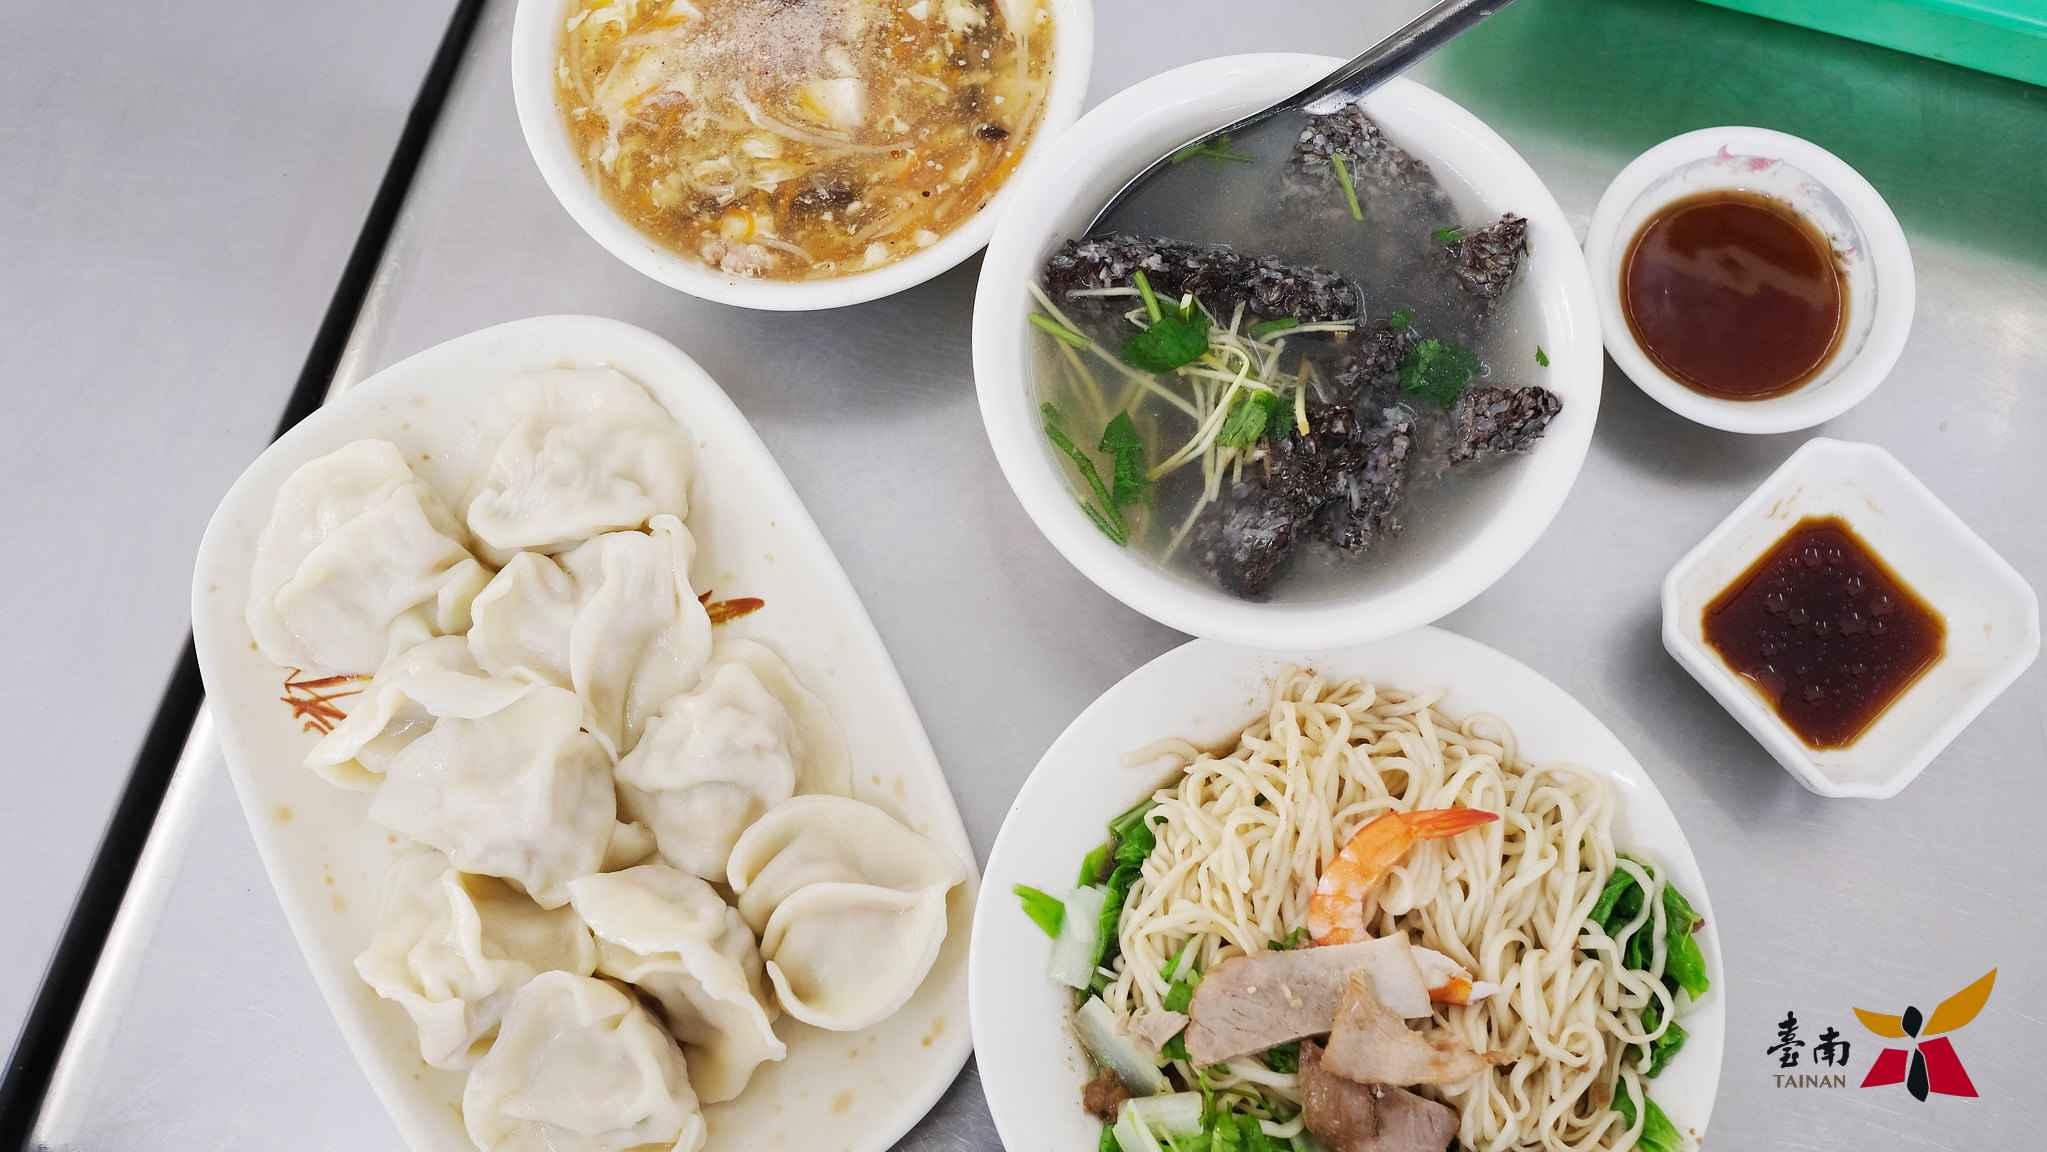 台南 中西區美食- Mytainan - 24